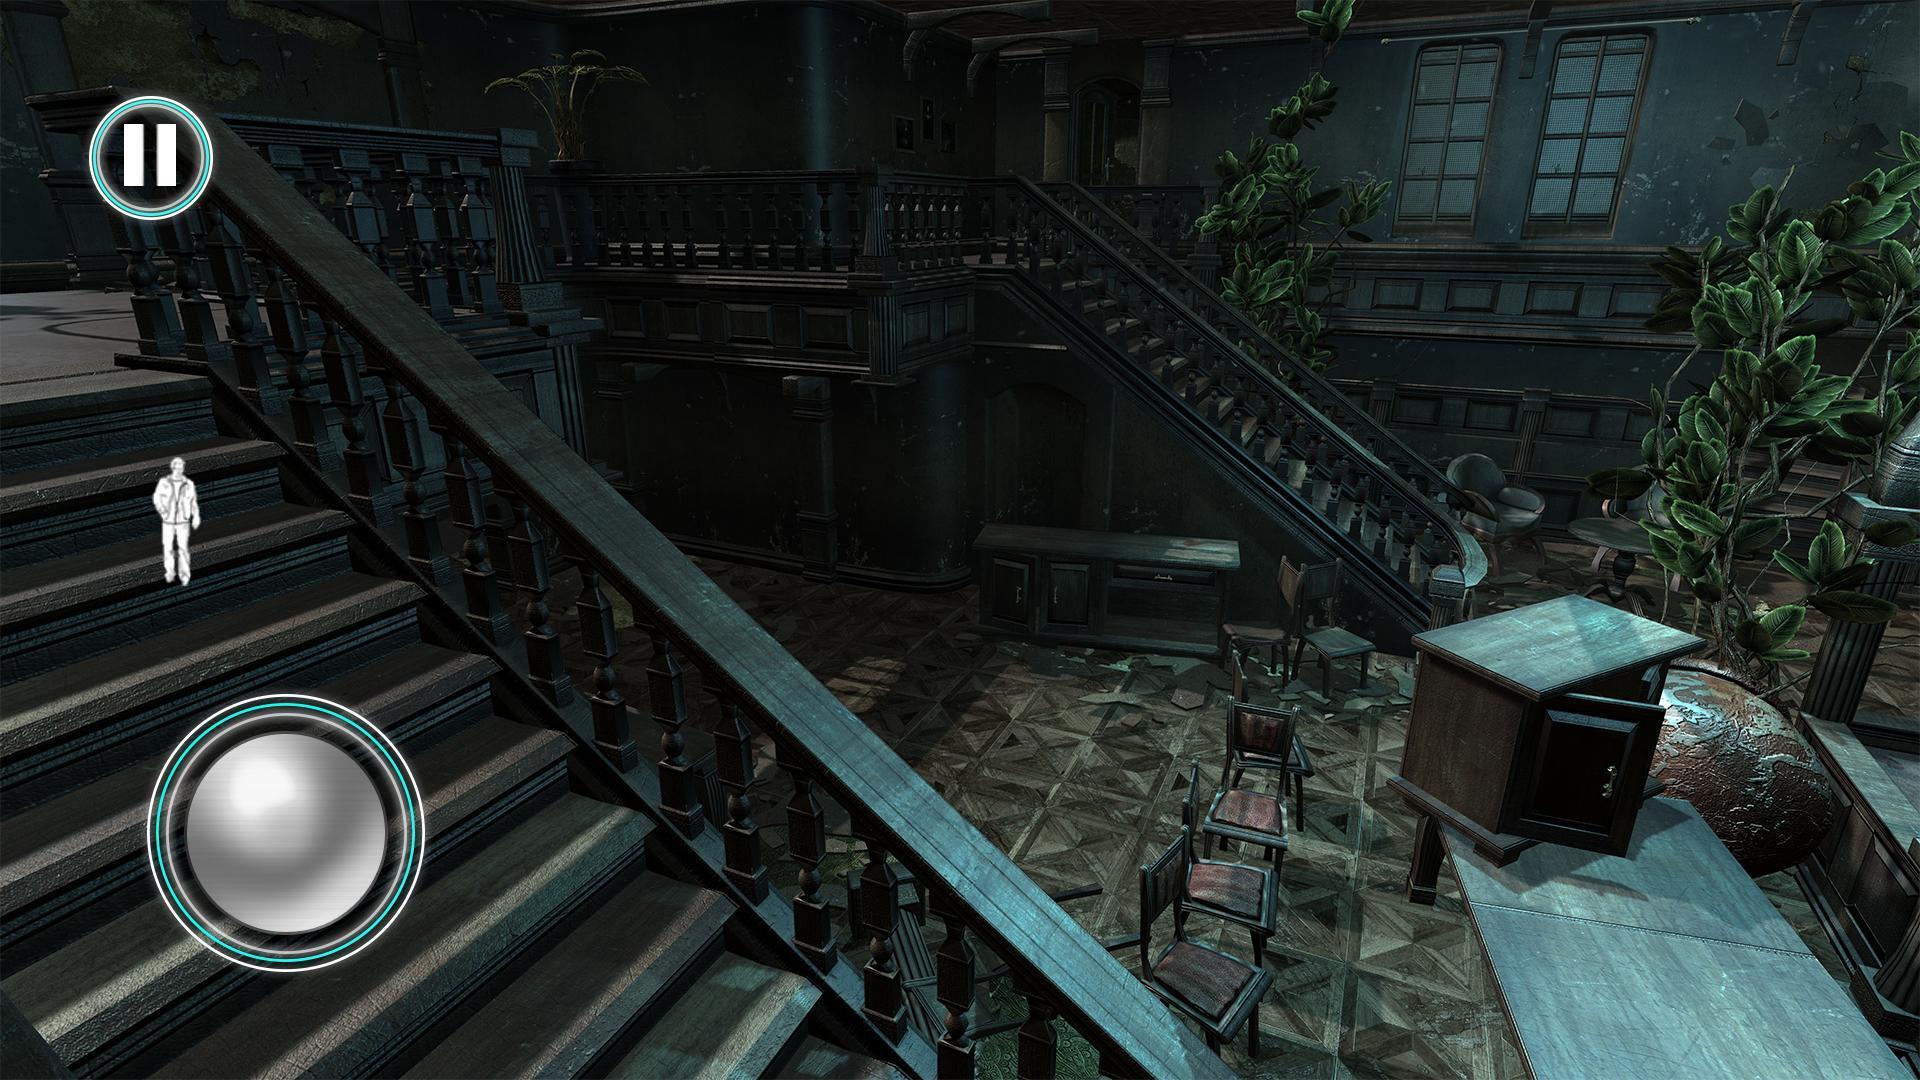 Scary Clown Horror Game Adventure 2.2 Screenshot 10